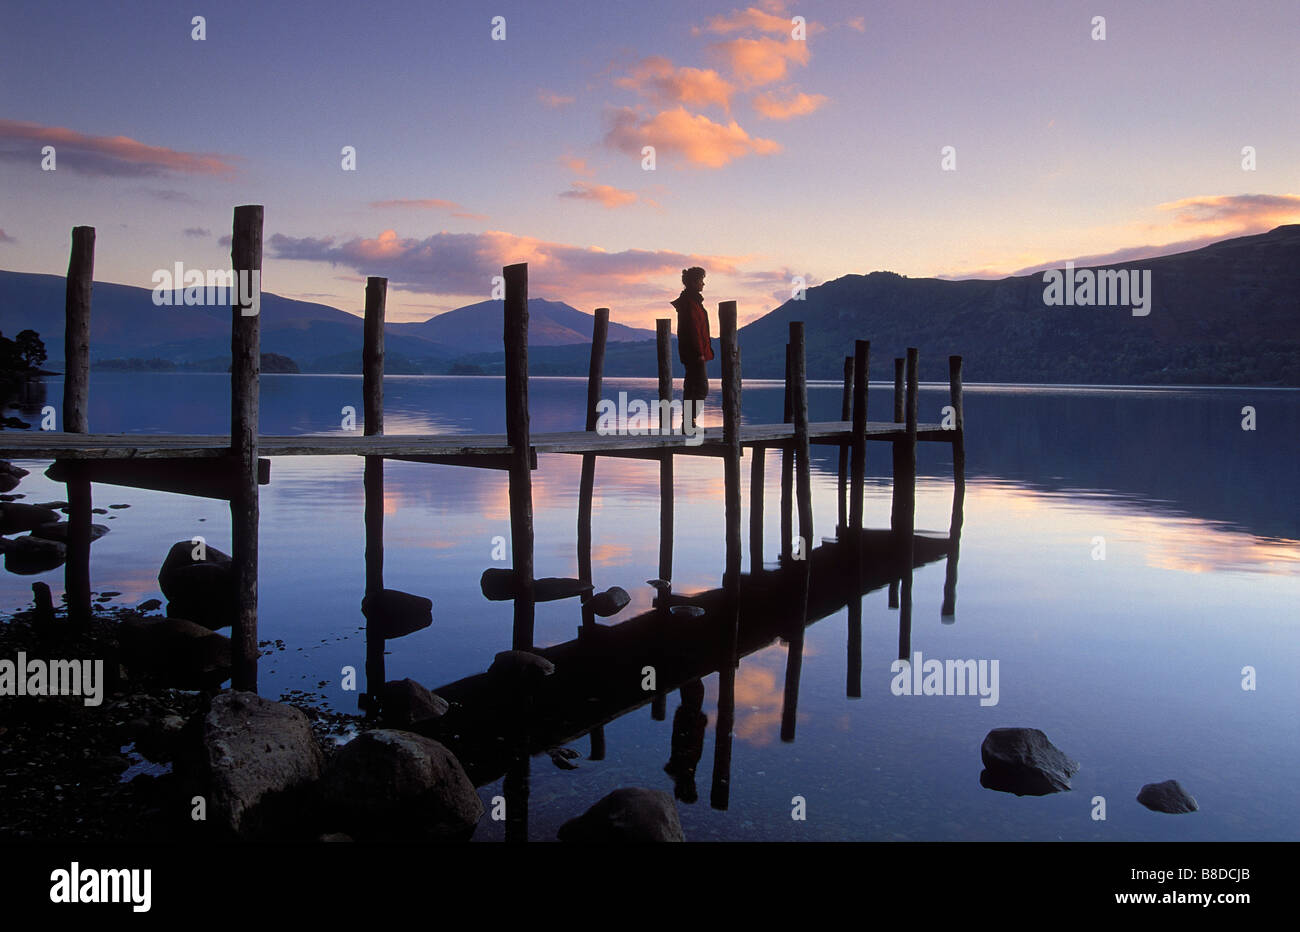 Derwentwater at dawn, Brandelhow Bay, Lake District National Park, Cumbria, England, UK - Stock Image